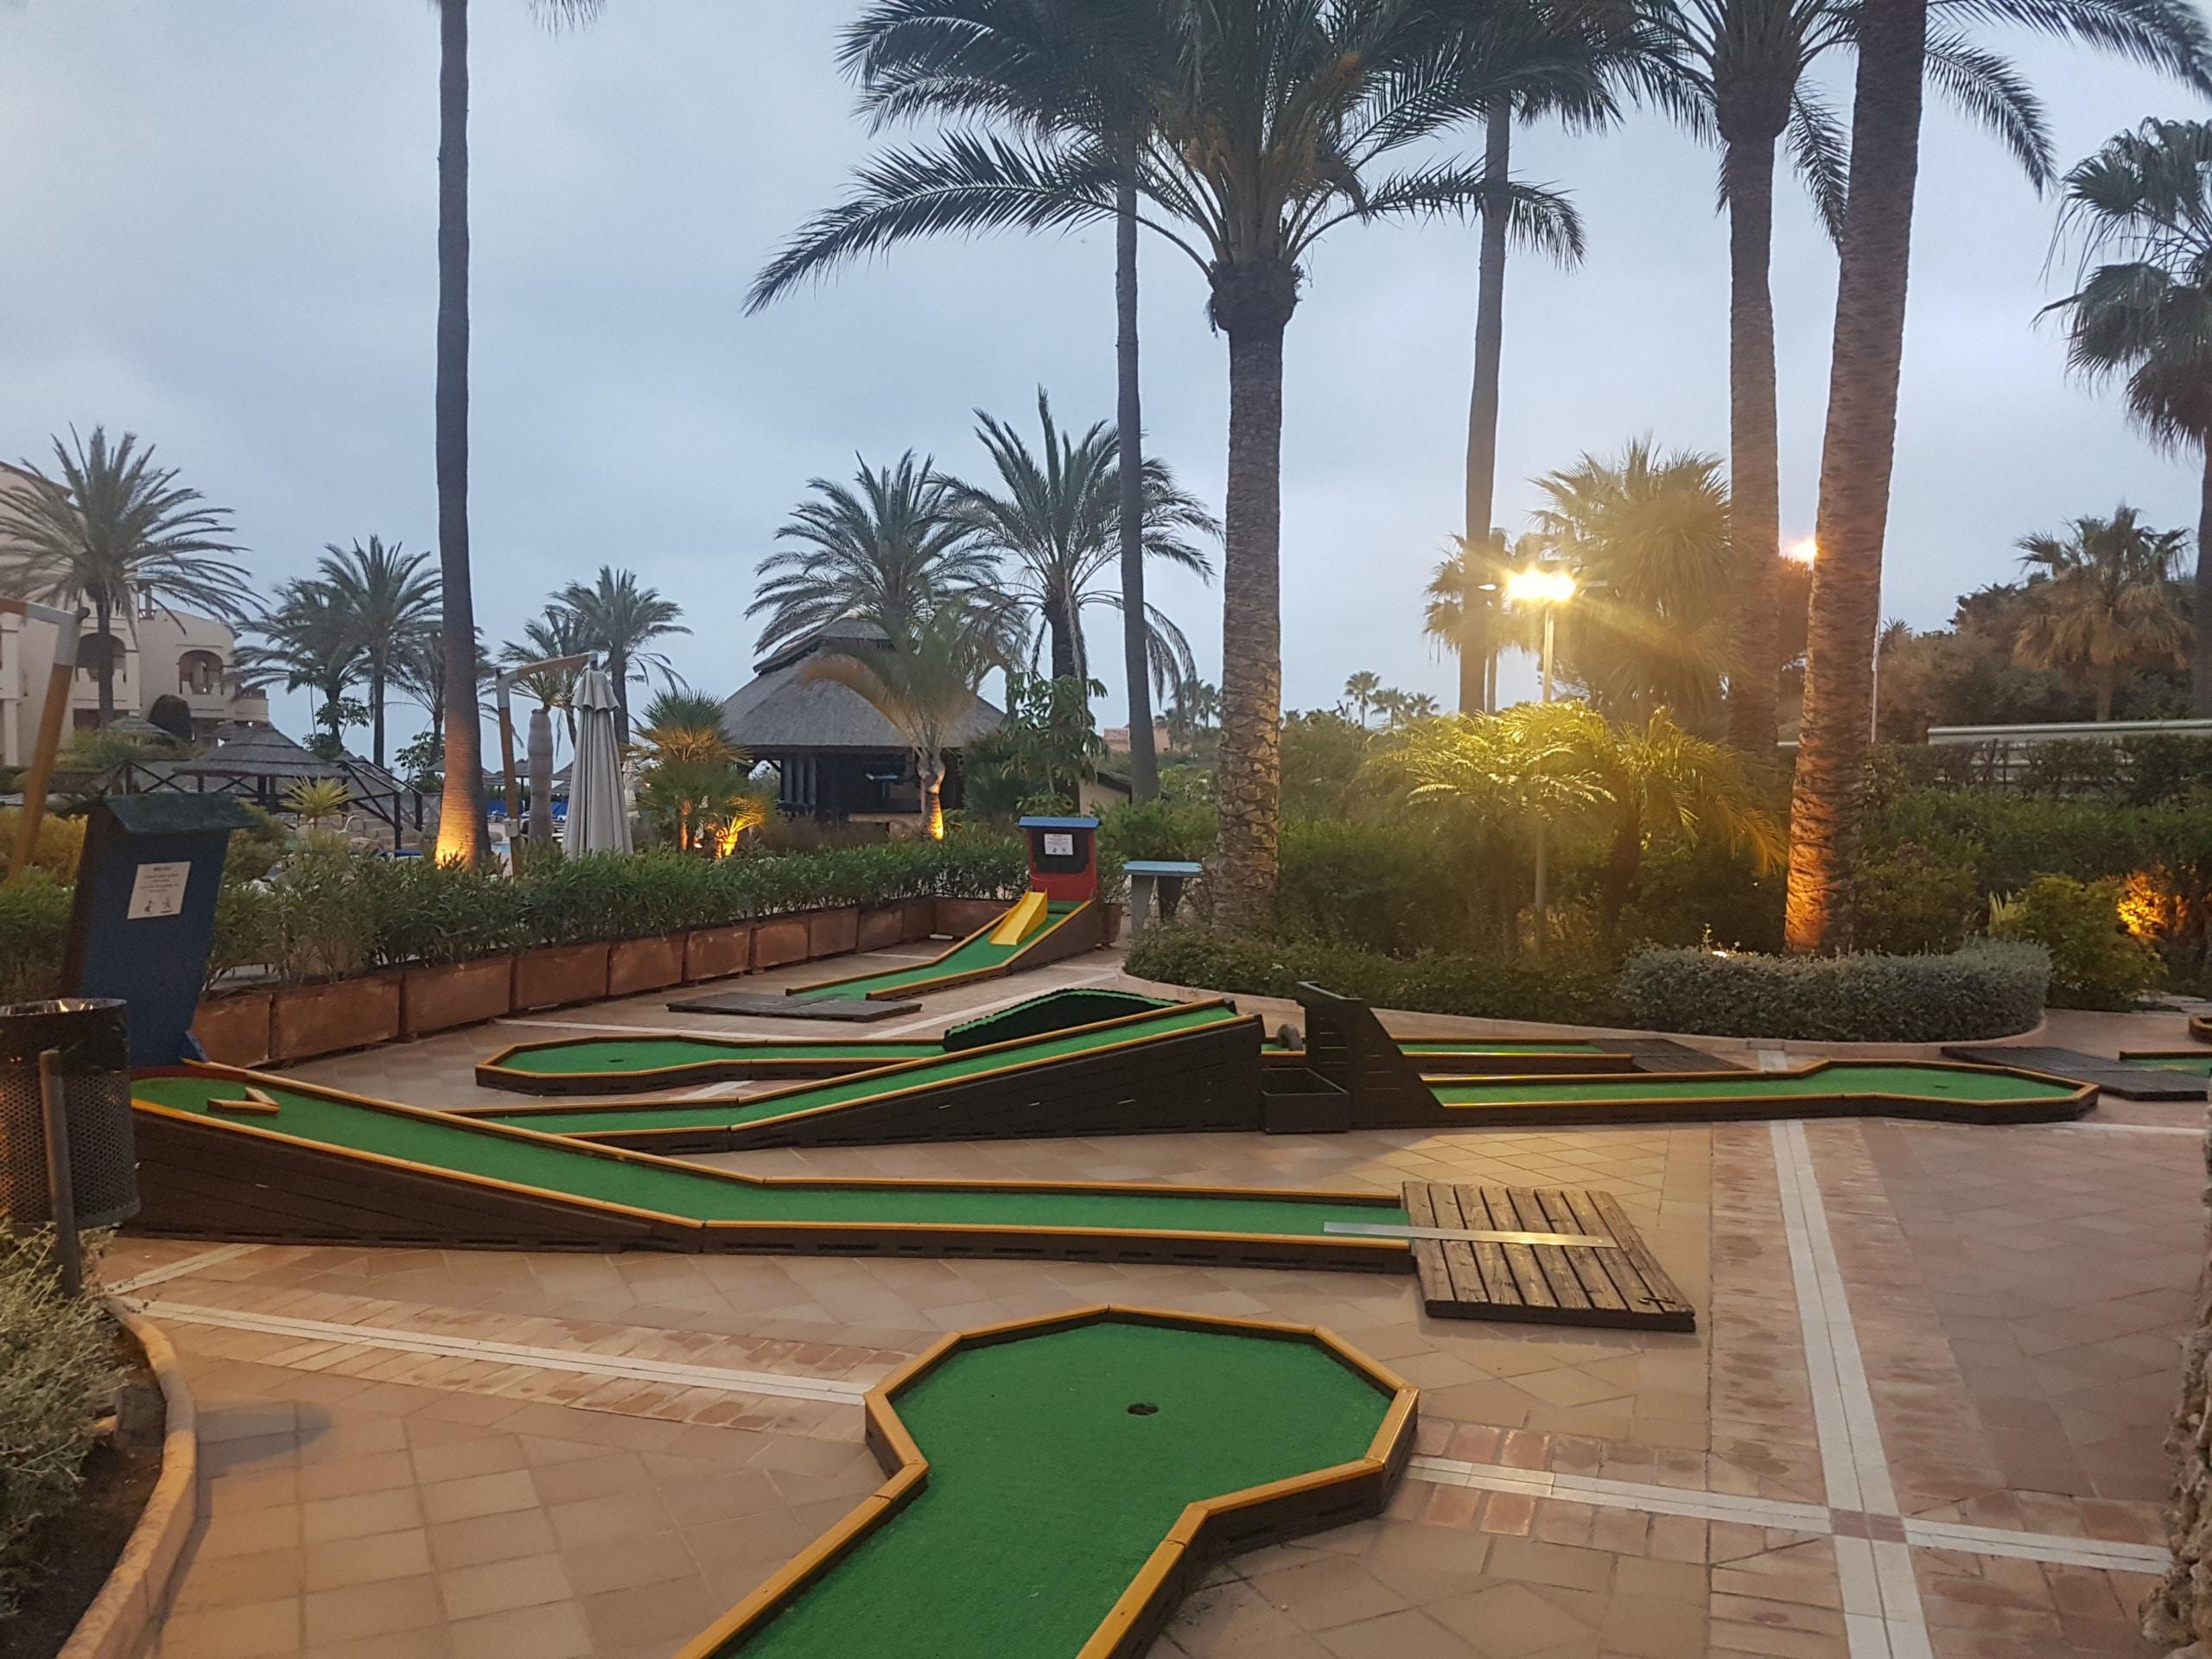 Mini golf at the resort